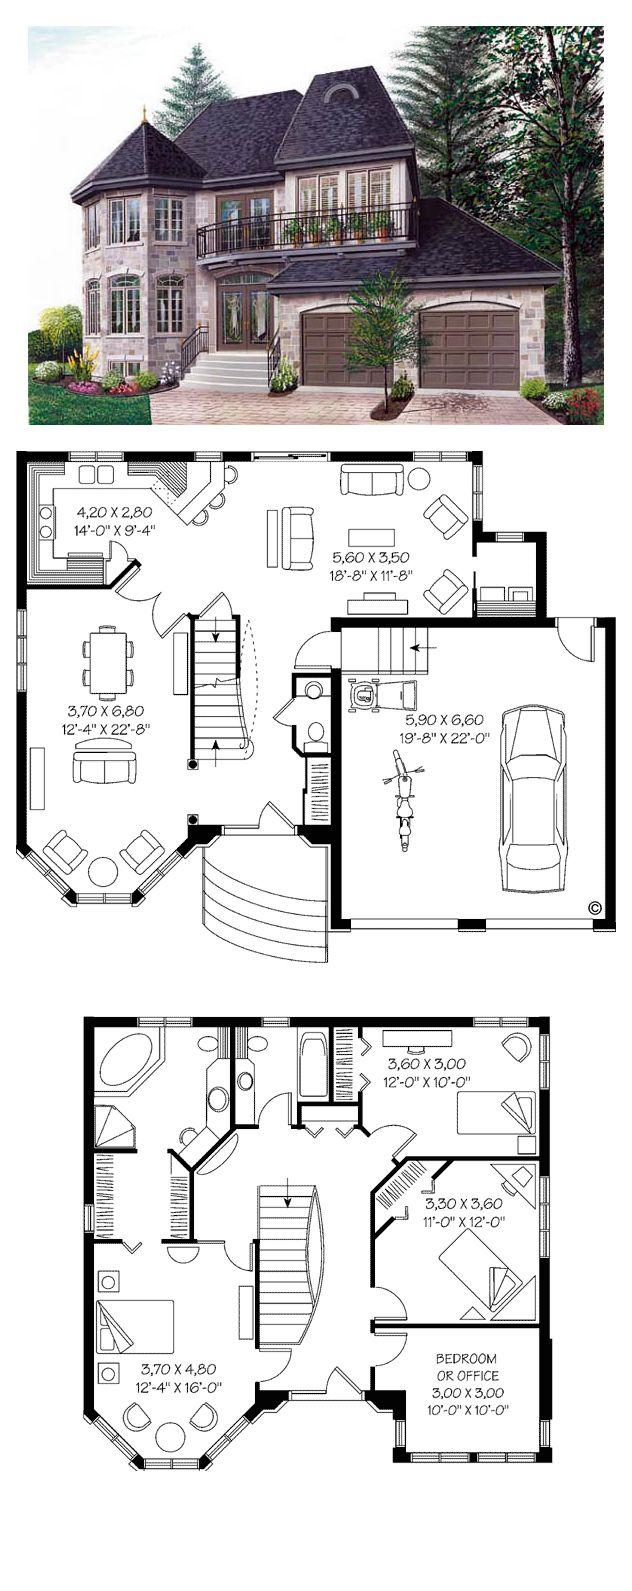 Drawn bedroom inside house #8